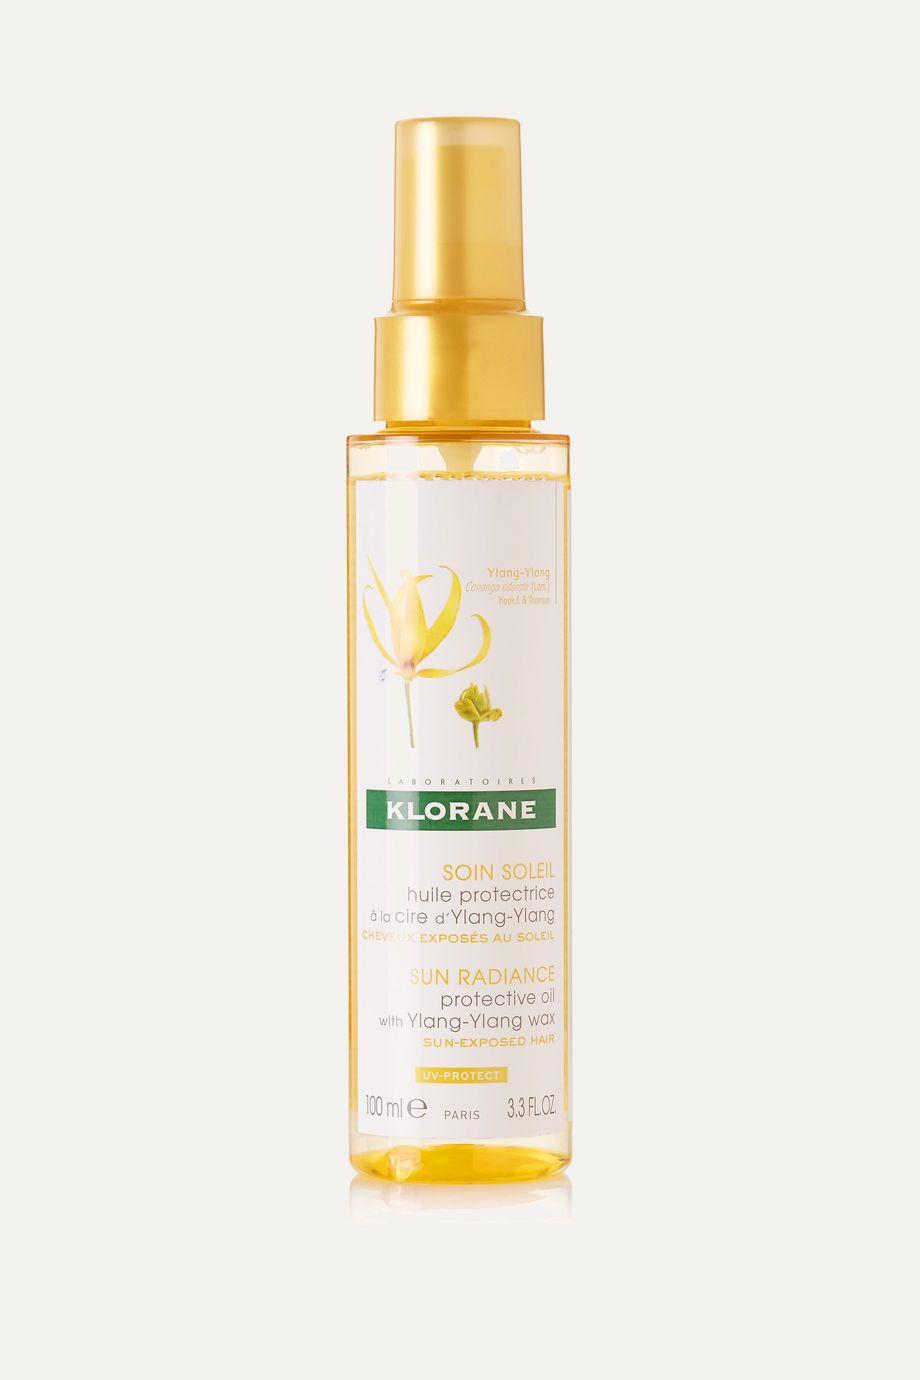 Klorane Sun Radiance Protective Oil, 100ml